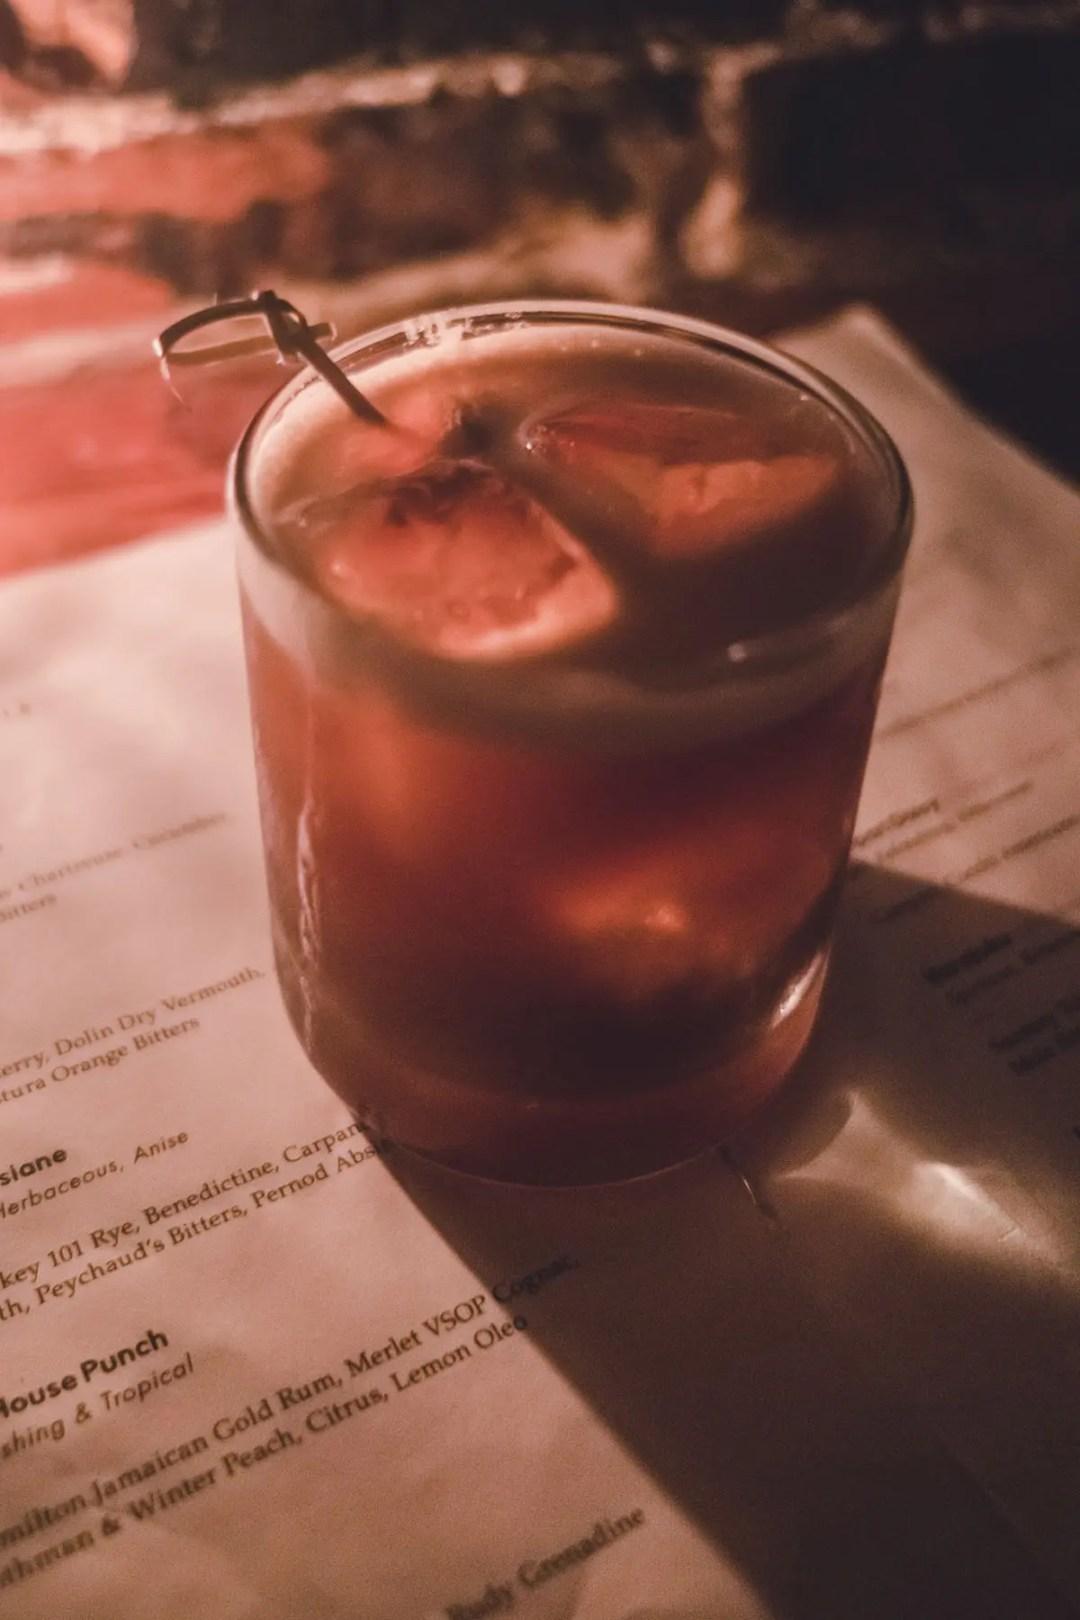 Hanson's Shoe Repair's Delicious Cocktails